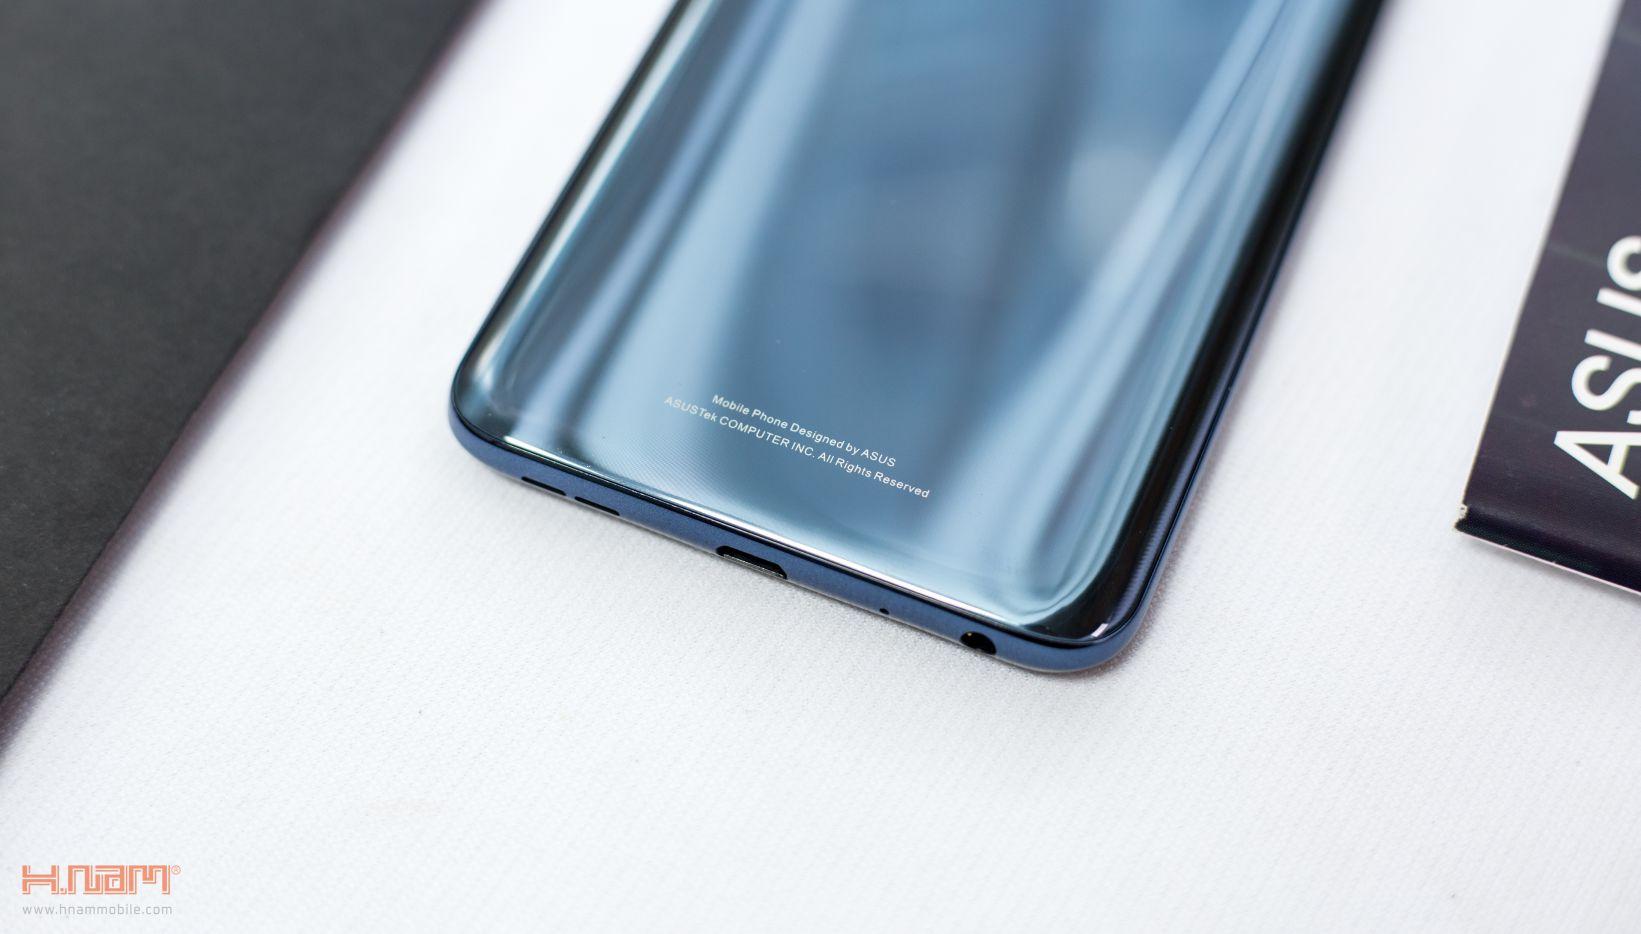 Trên tay Zenfone Max Pro M2: Snapdragon 660, pin 5000mAh, 5.29 triệu hình 3